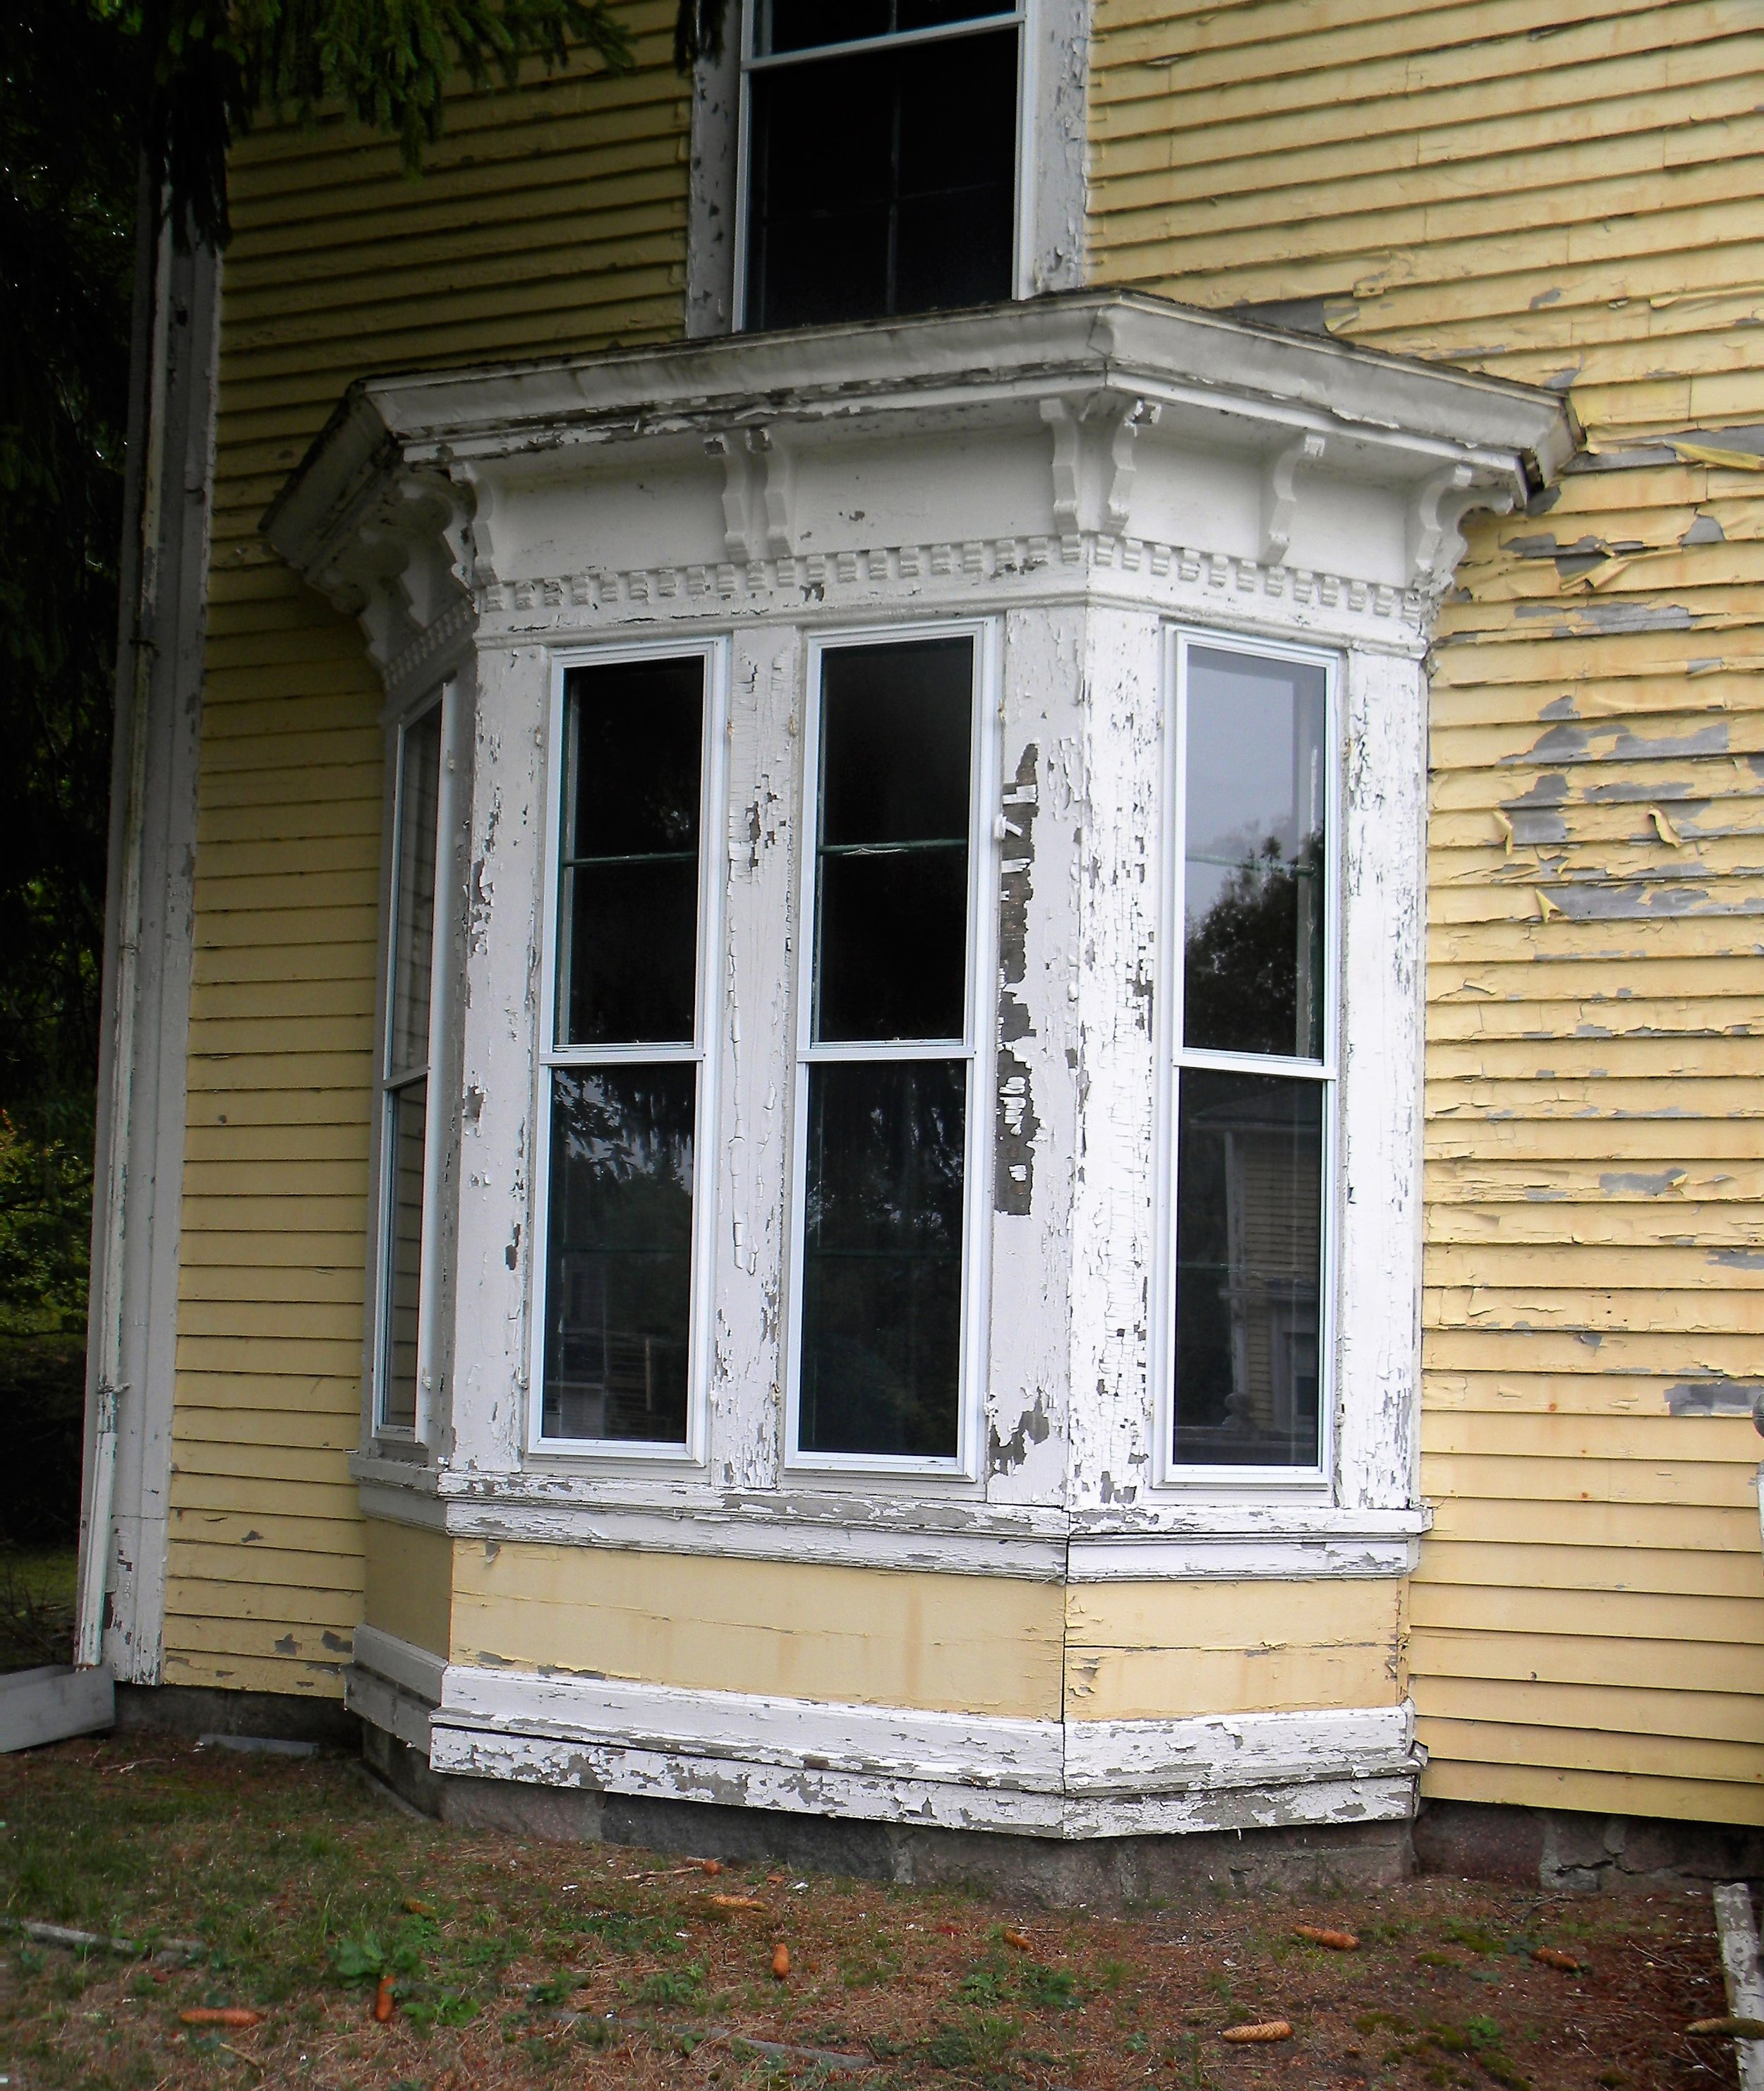 McGlashan-Nickerson Bay Window Detail.jpg